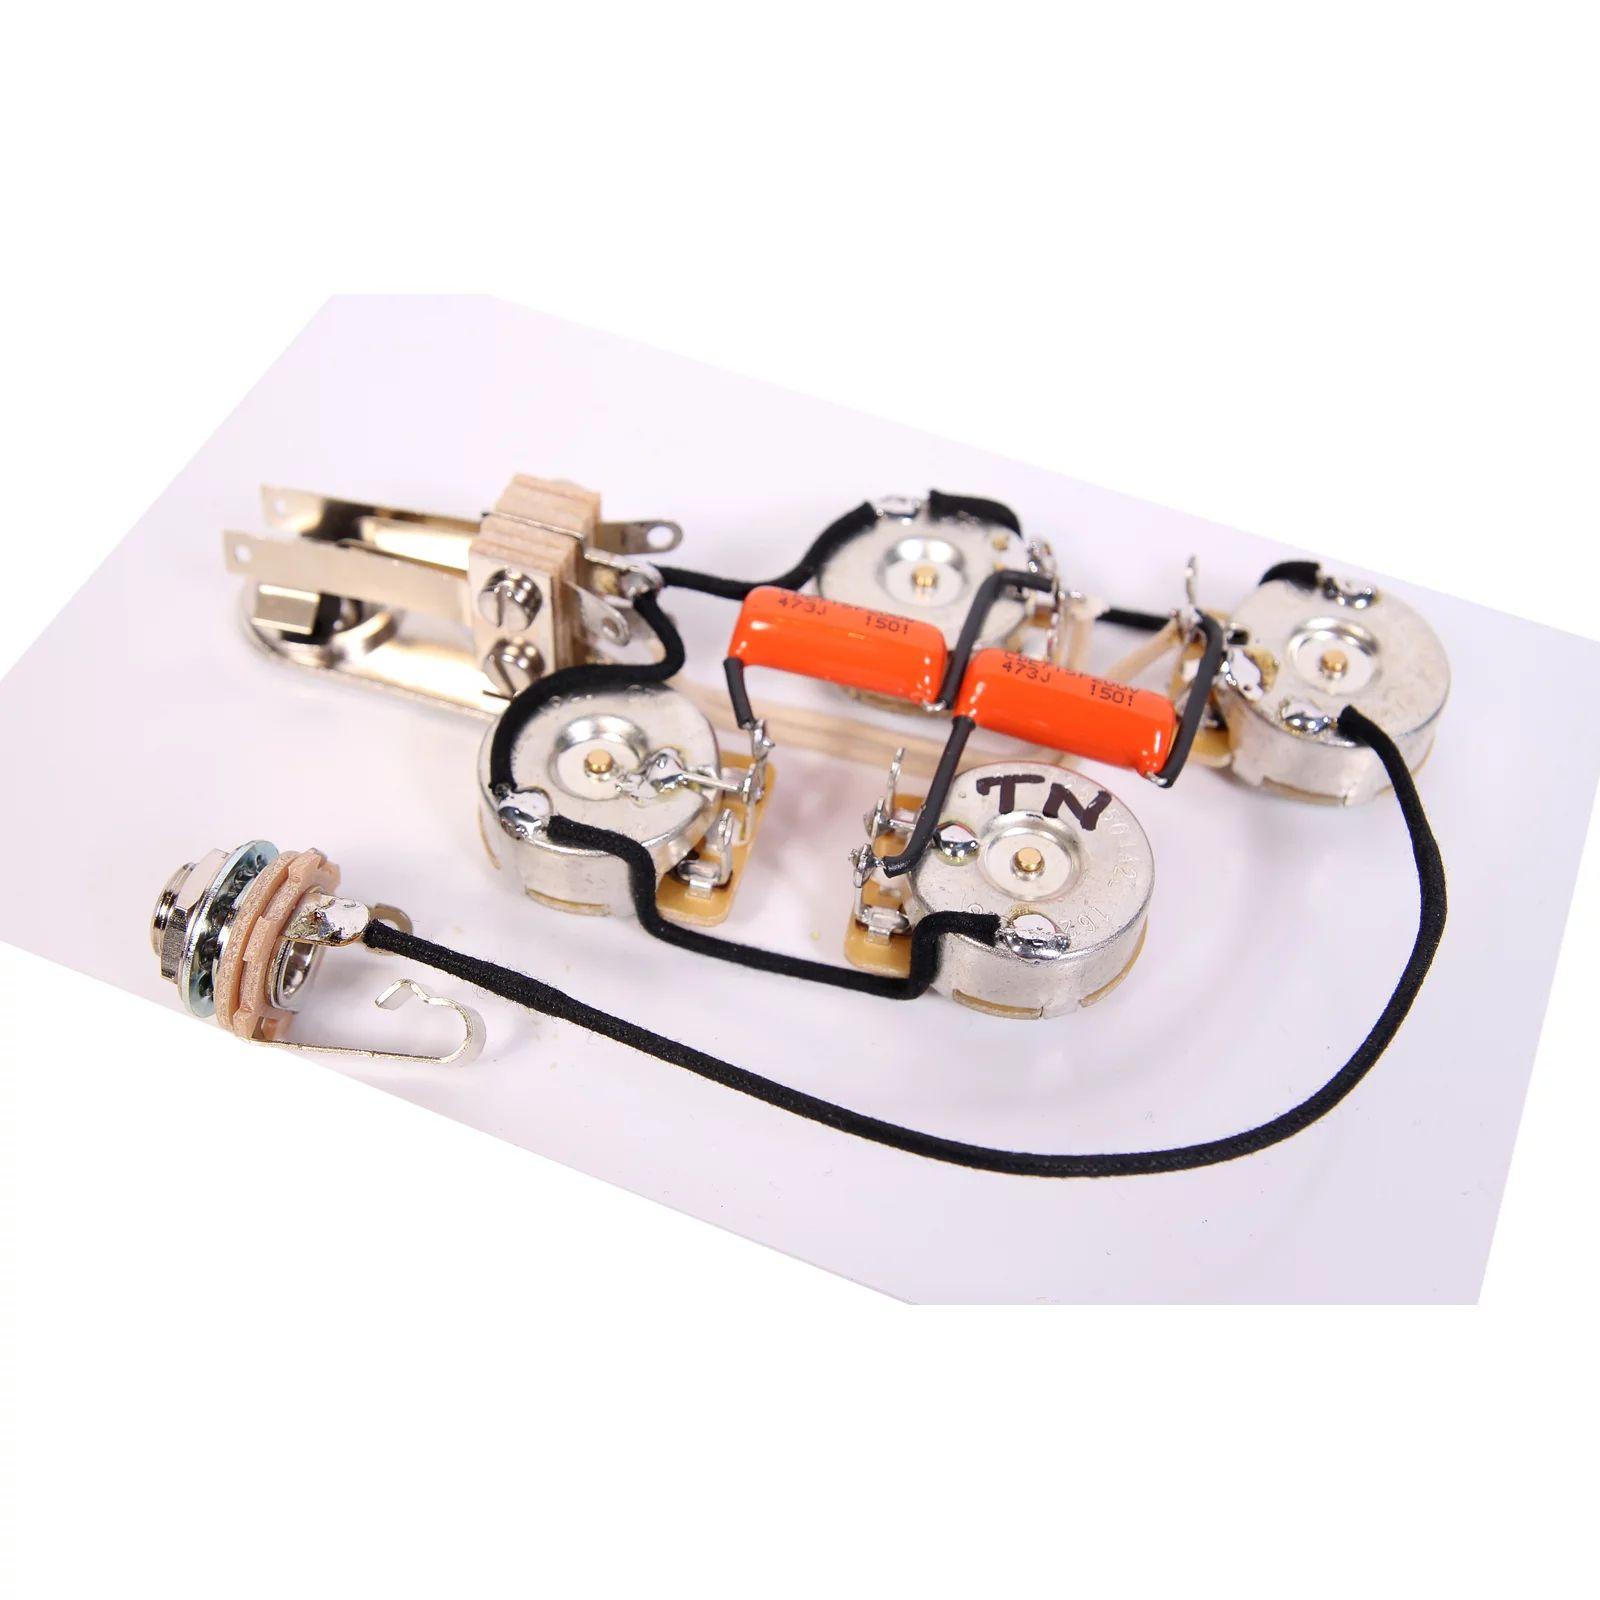 viper 5900 wiring diagram for a viper 5101 diagram wiring